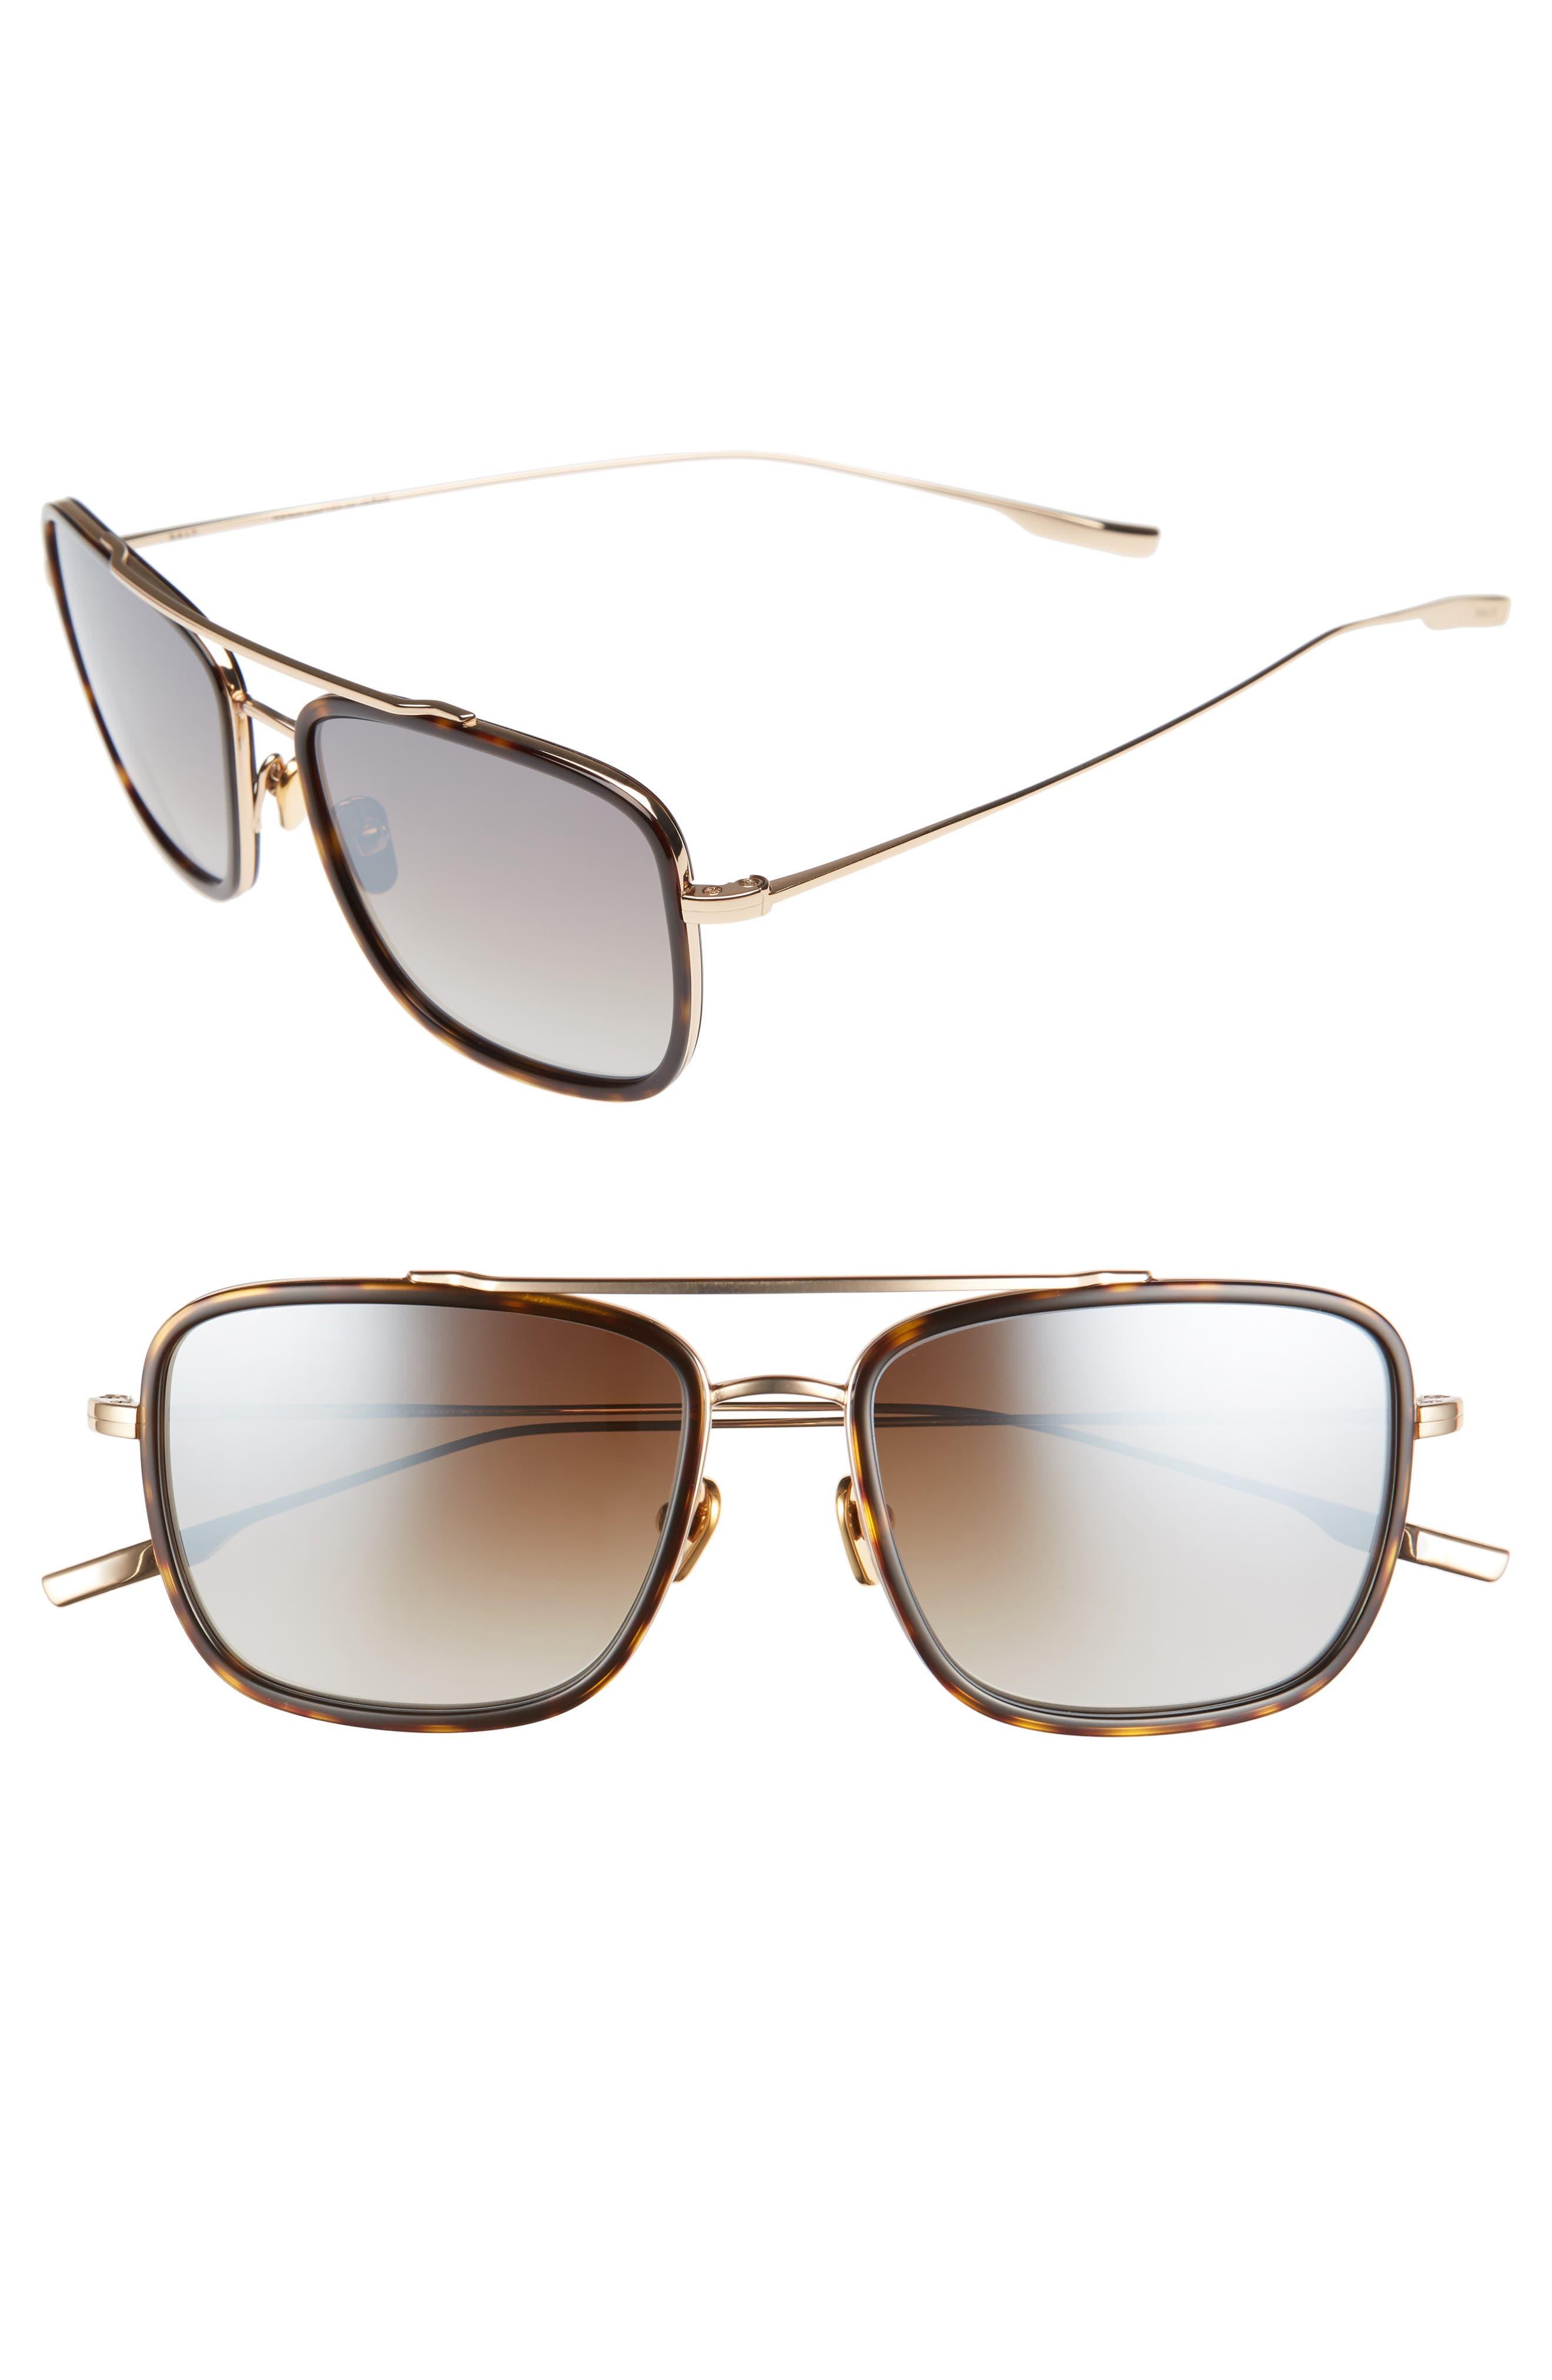 Harrison 54mm Polarized Sunglasses,                             Main thumbnail 1, color,                             HONEY GOLD/ OILED BARK